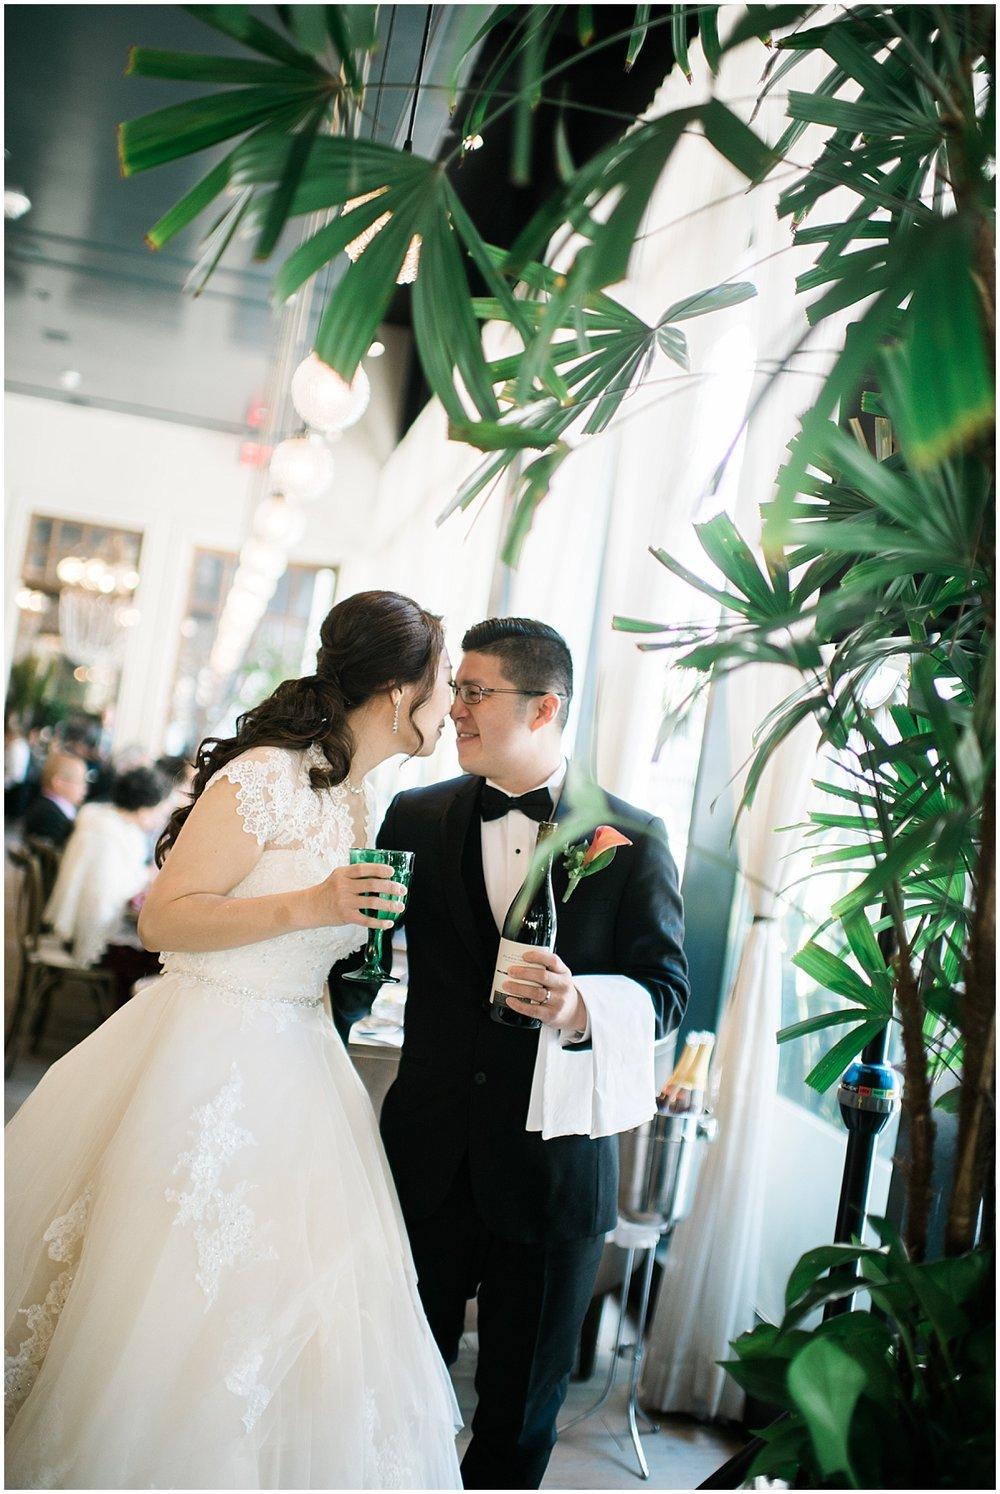 Faith-and-Flower-Wedding-Soo-Dan-Carissa-Woo-Photography_0052.jpg